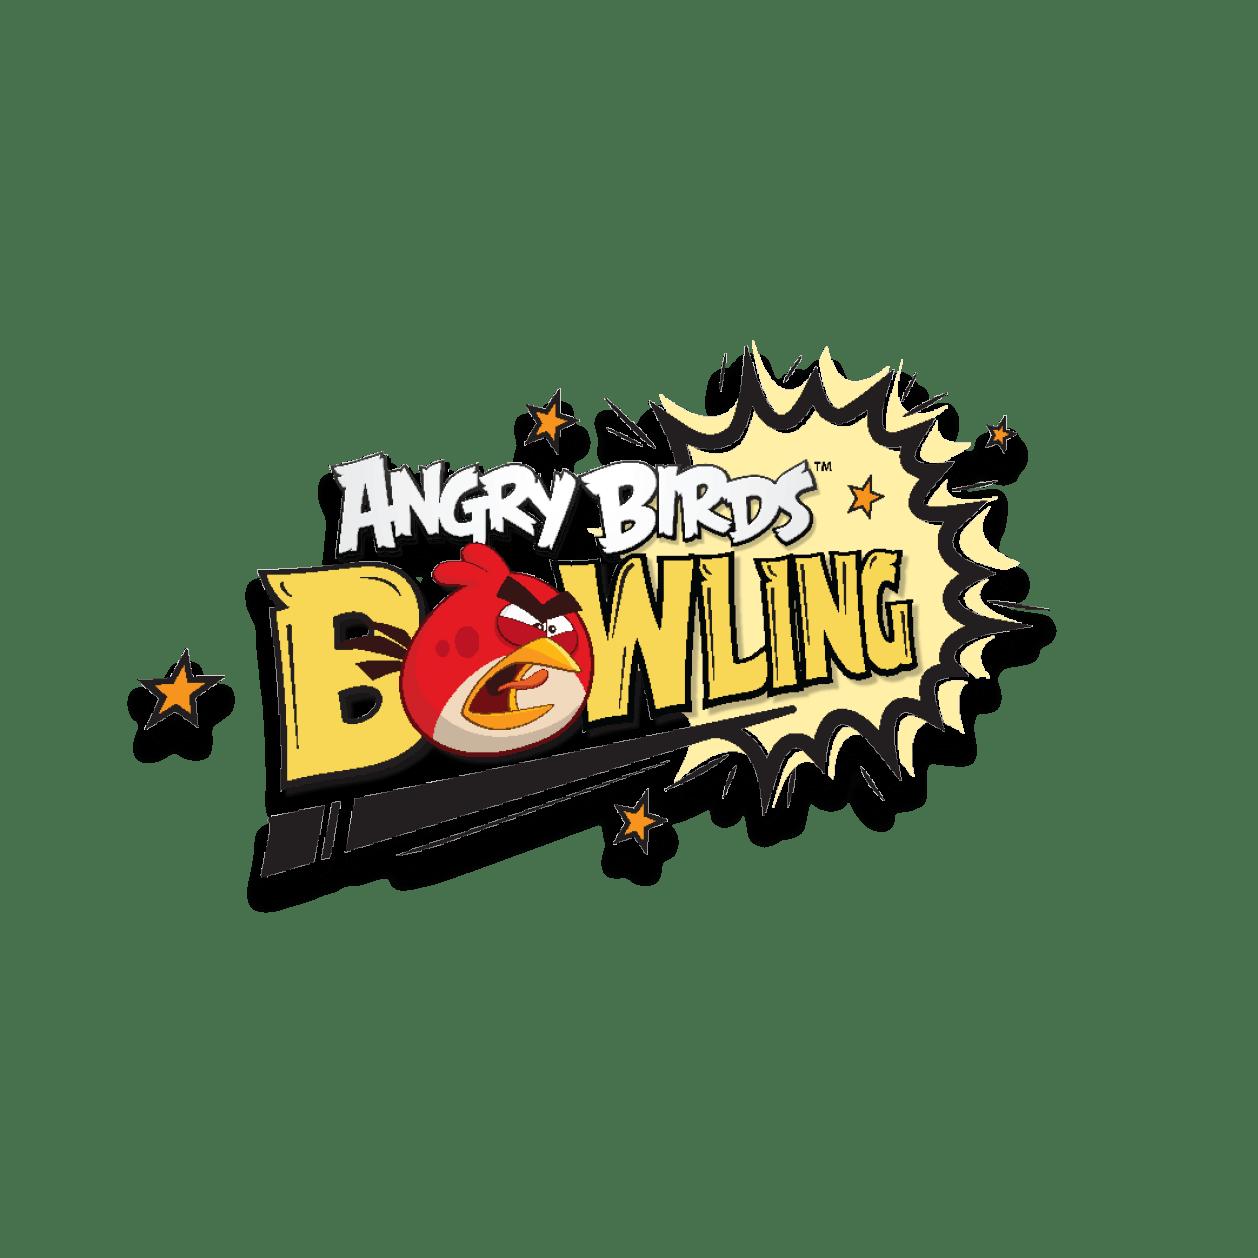 angry-birds-logo-1